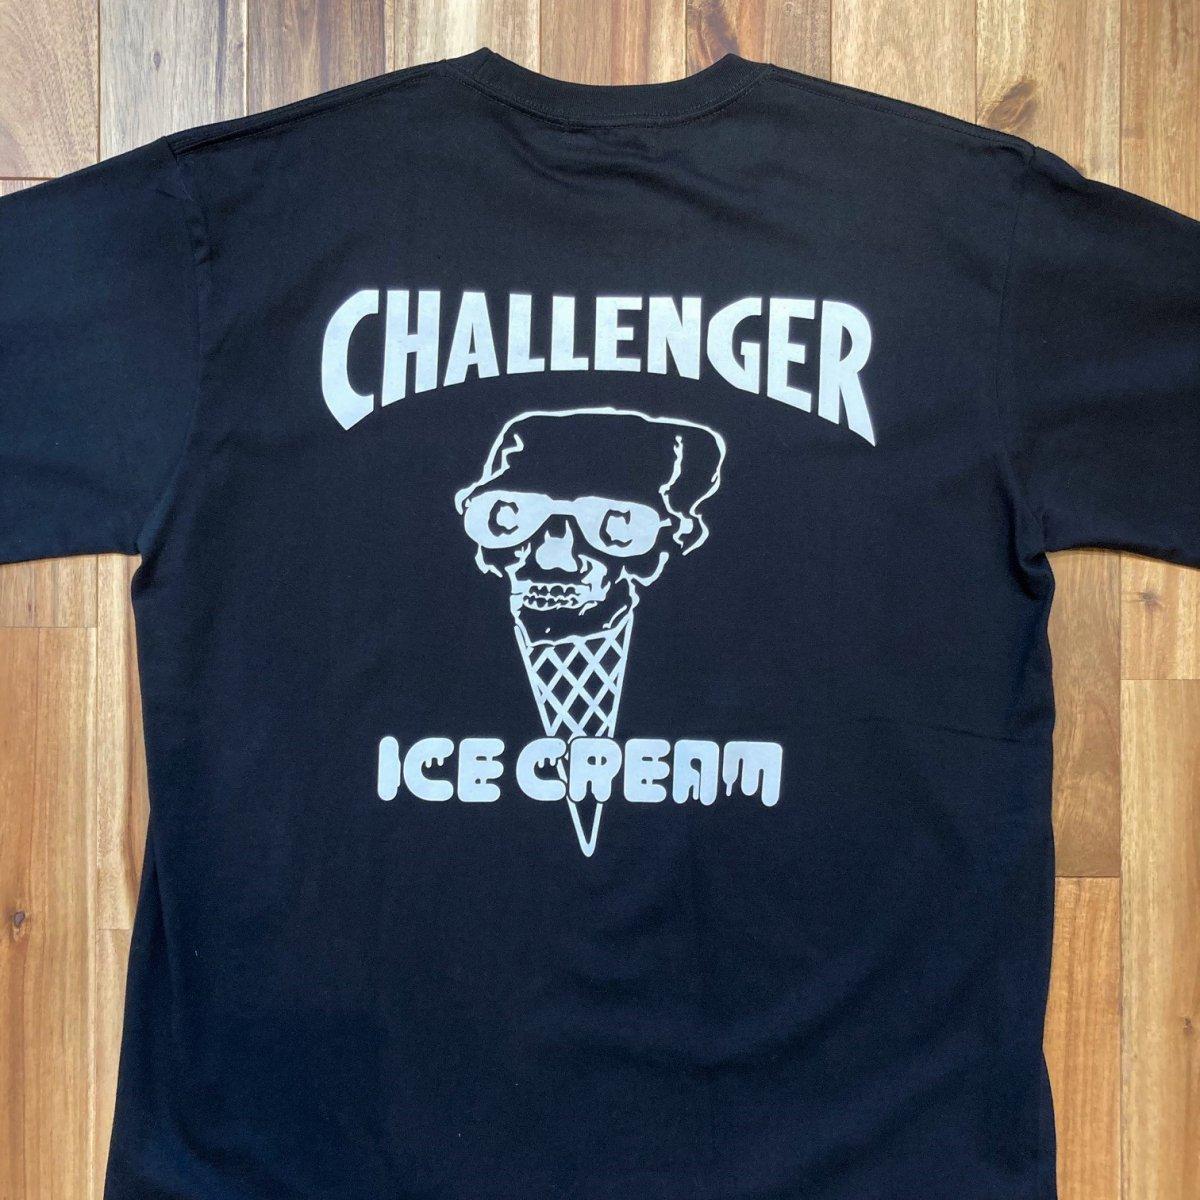 <img class='new_mark_img1' src='https://img.shop-pro.jp/img/new/icons3.gif' style='border:none;display:inline;margin:0px;padding:0px;width:auto;' />ICE CREAM アイスクリーム / Tシャツ × CHALLENGER SKULL T-SHIRT 【BLACK】